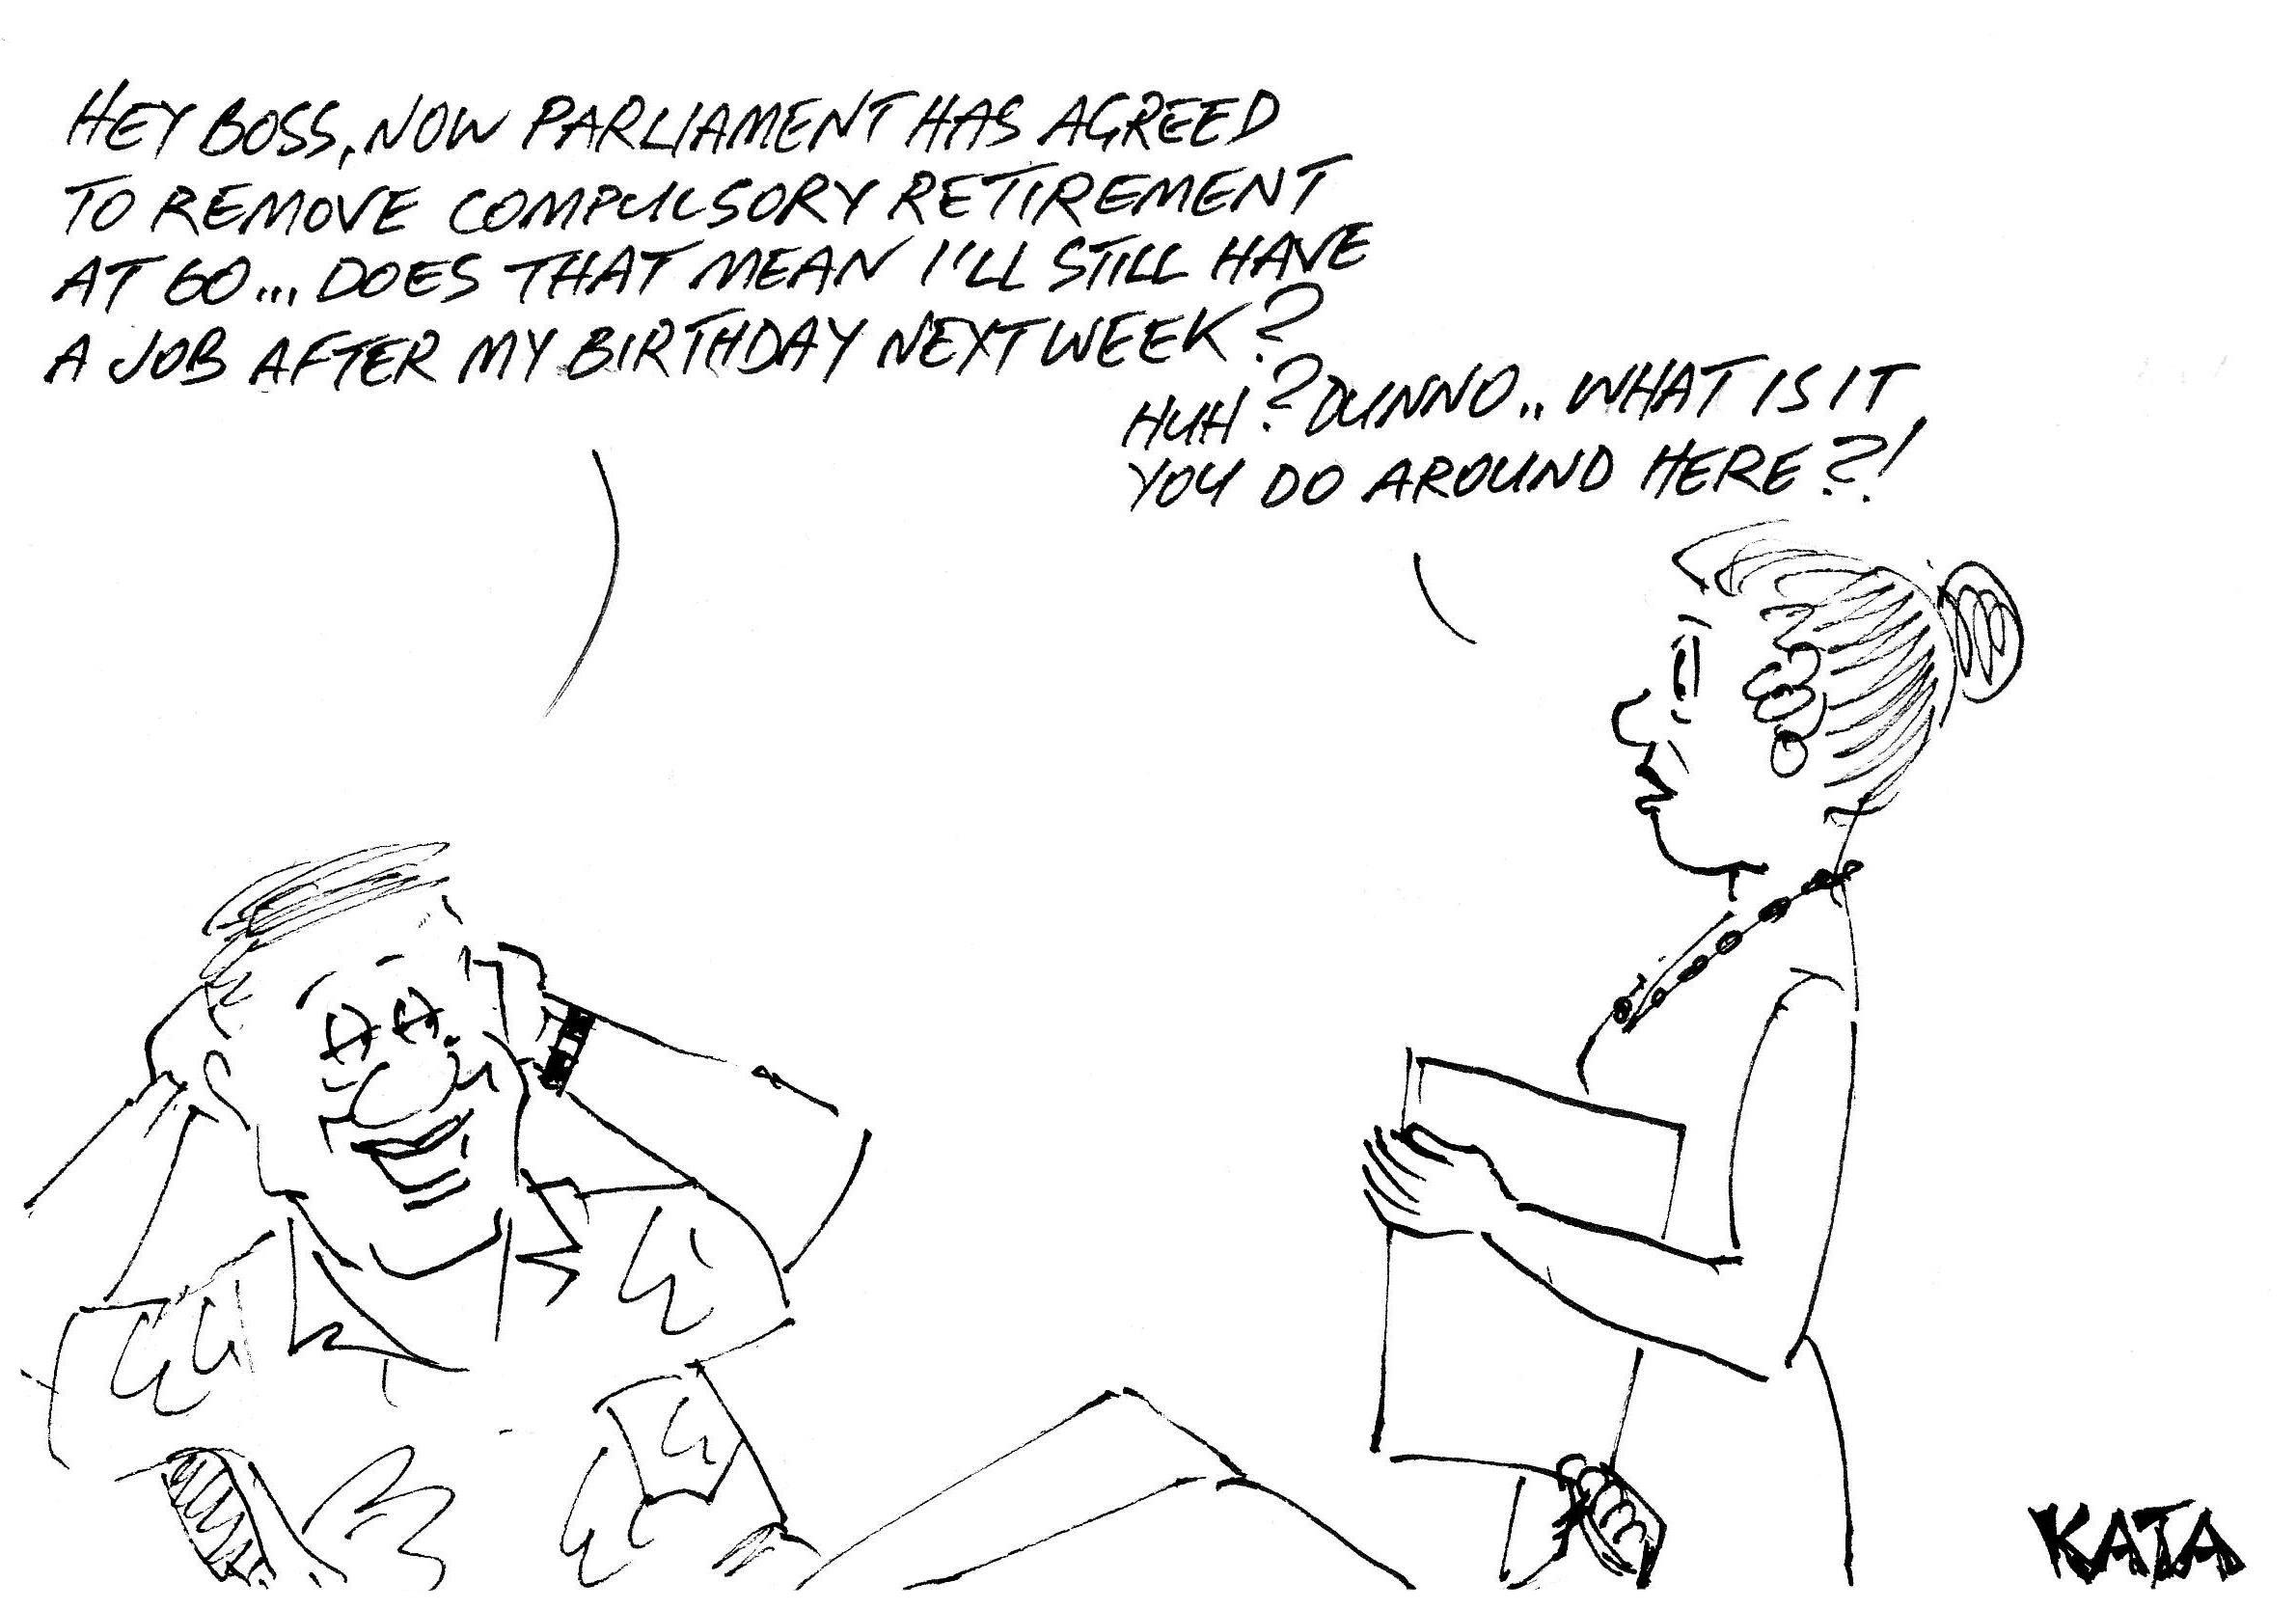 KATA: Raising the compulsory retirement age